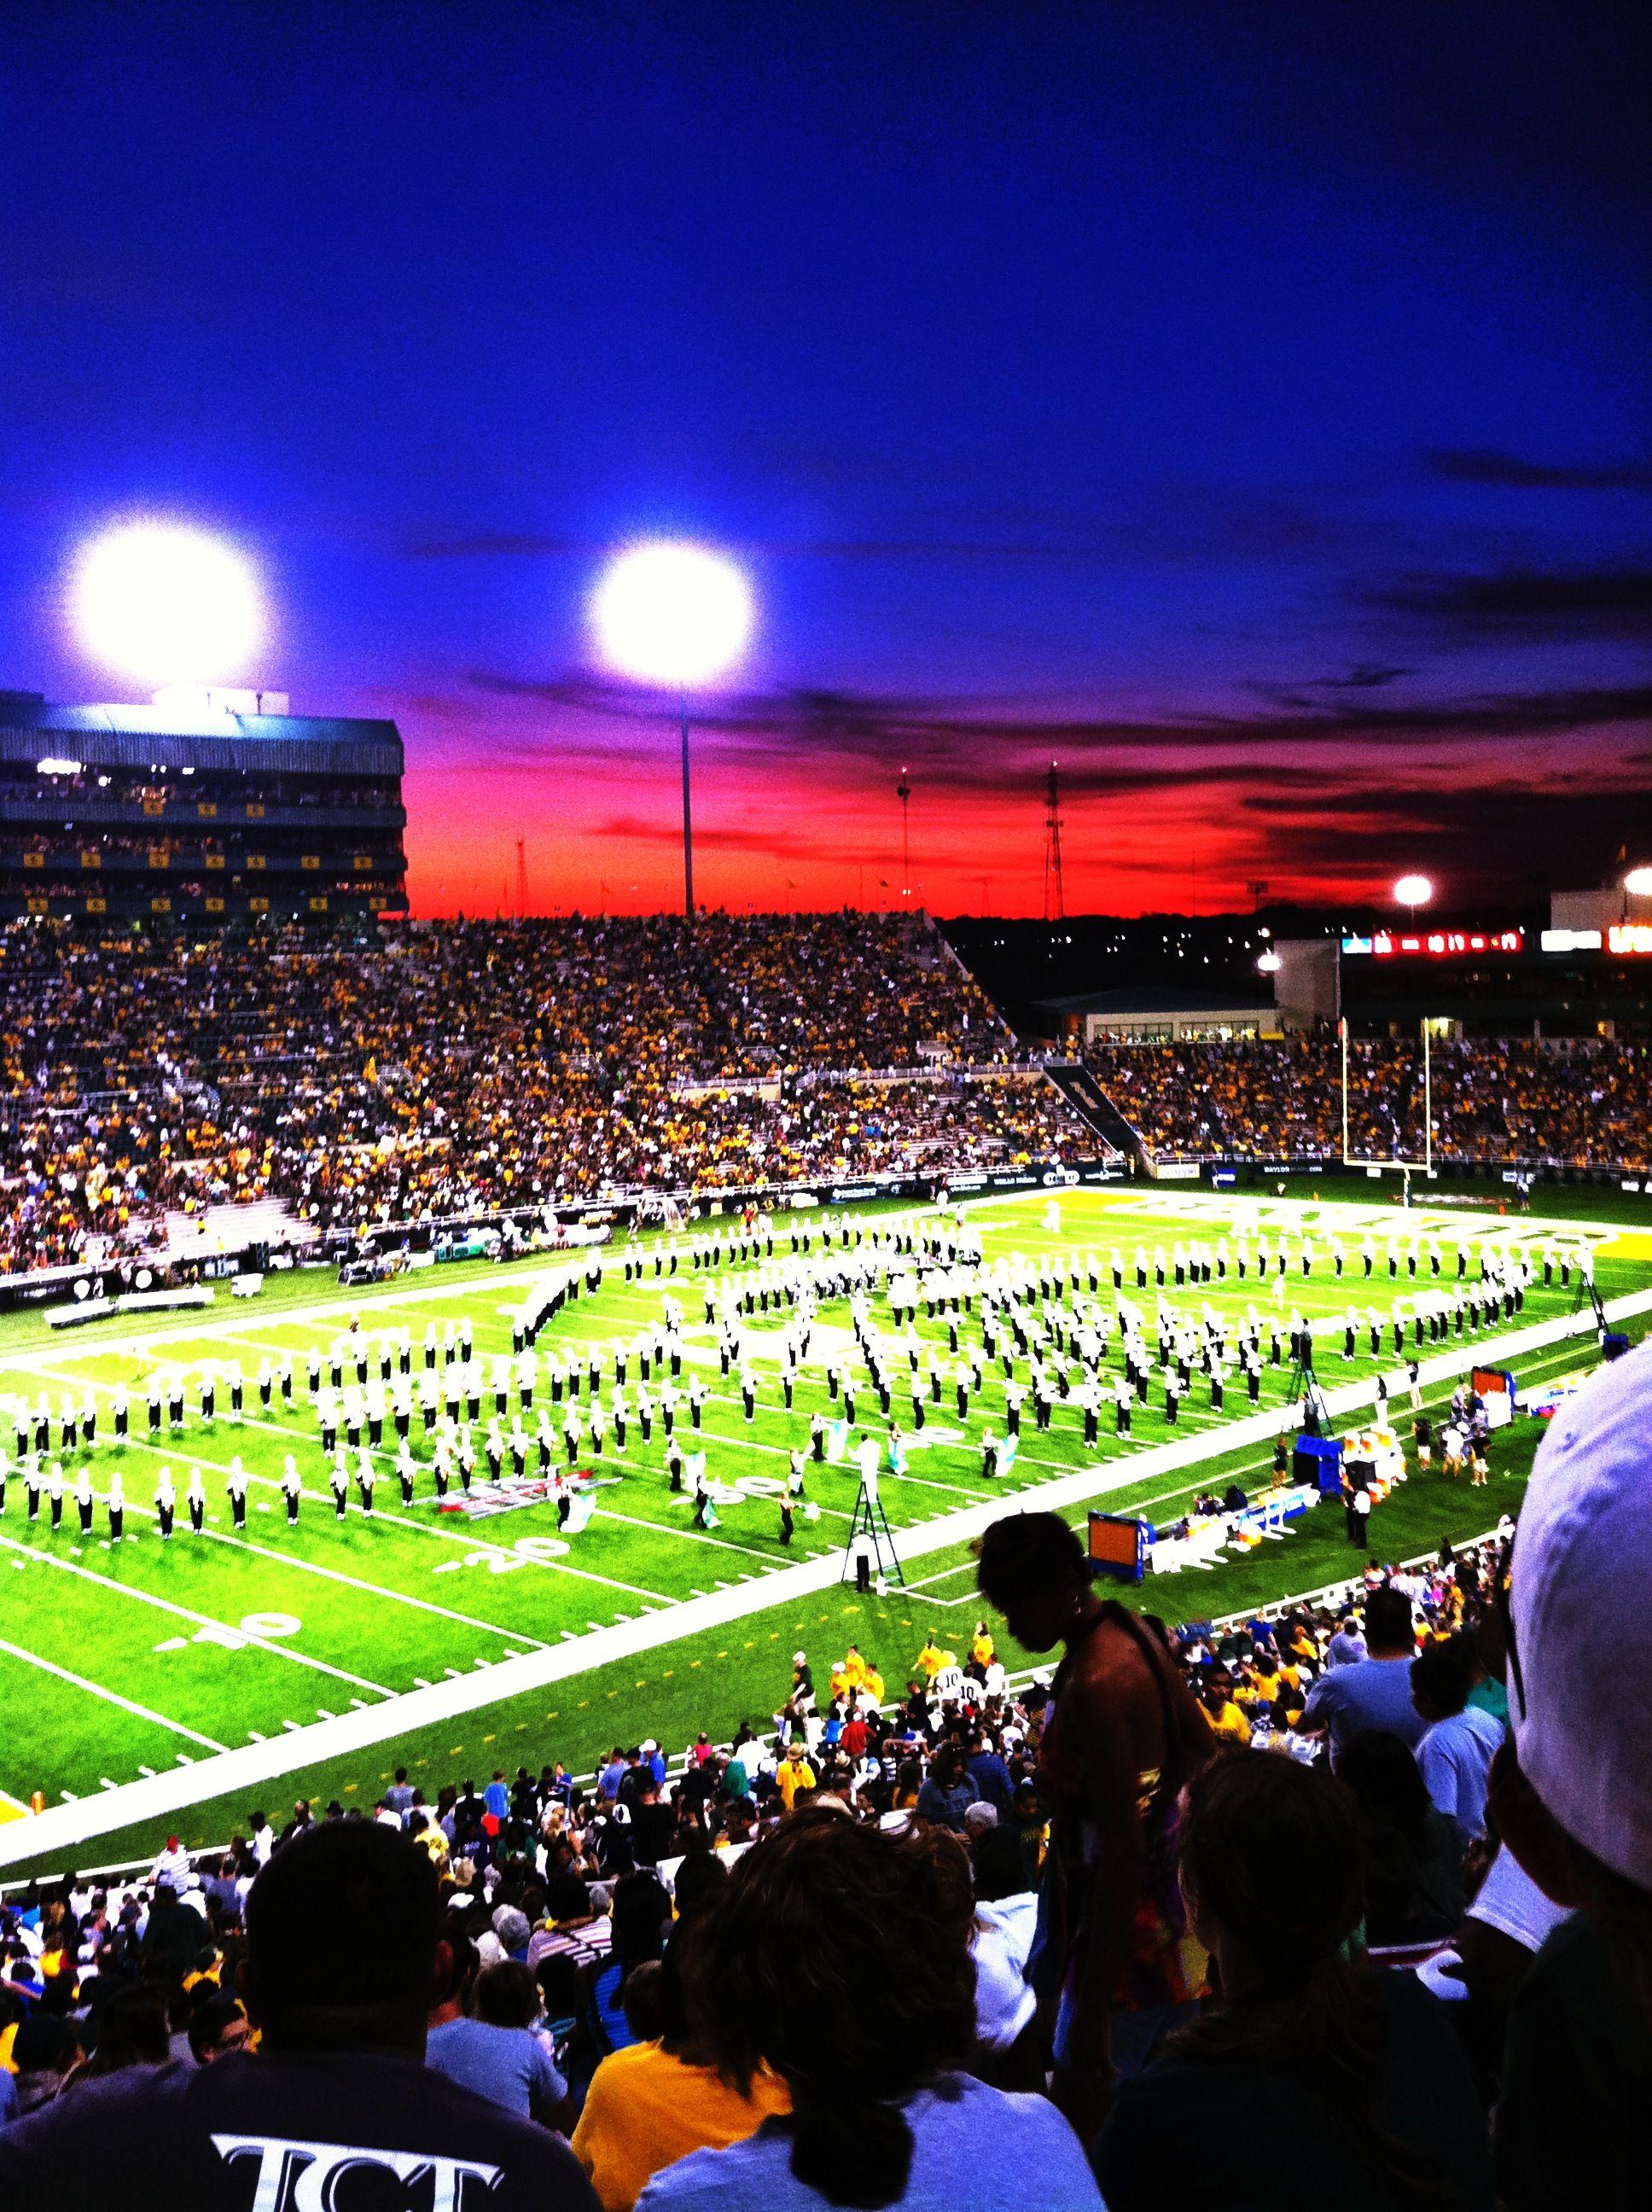 Baylor University Golden Wave Marching Band, Waco, TX